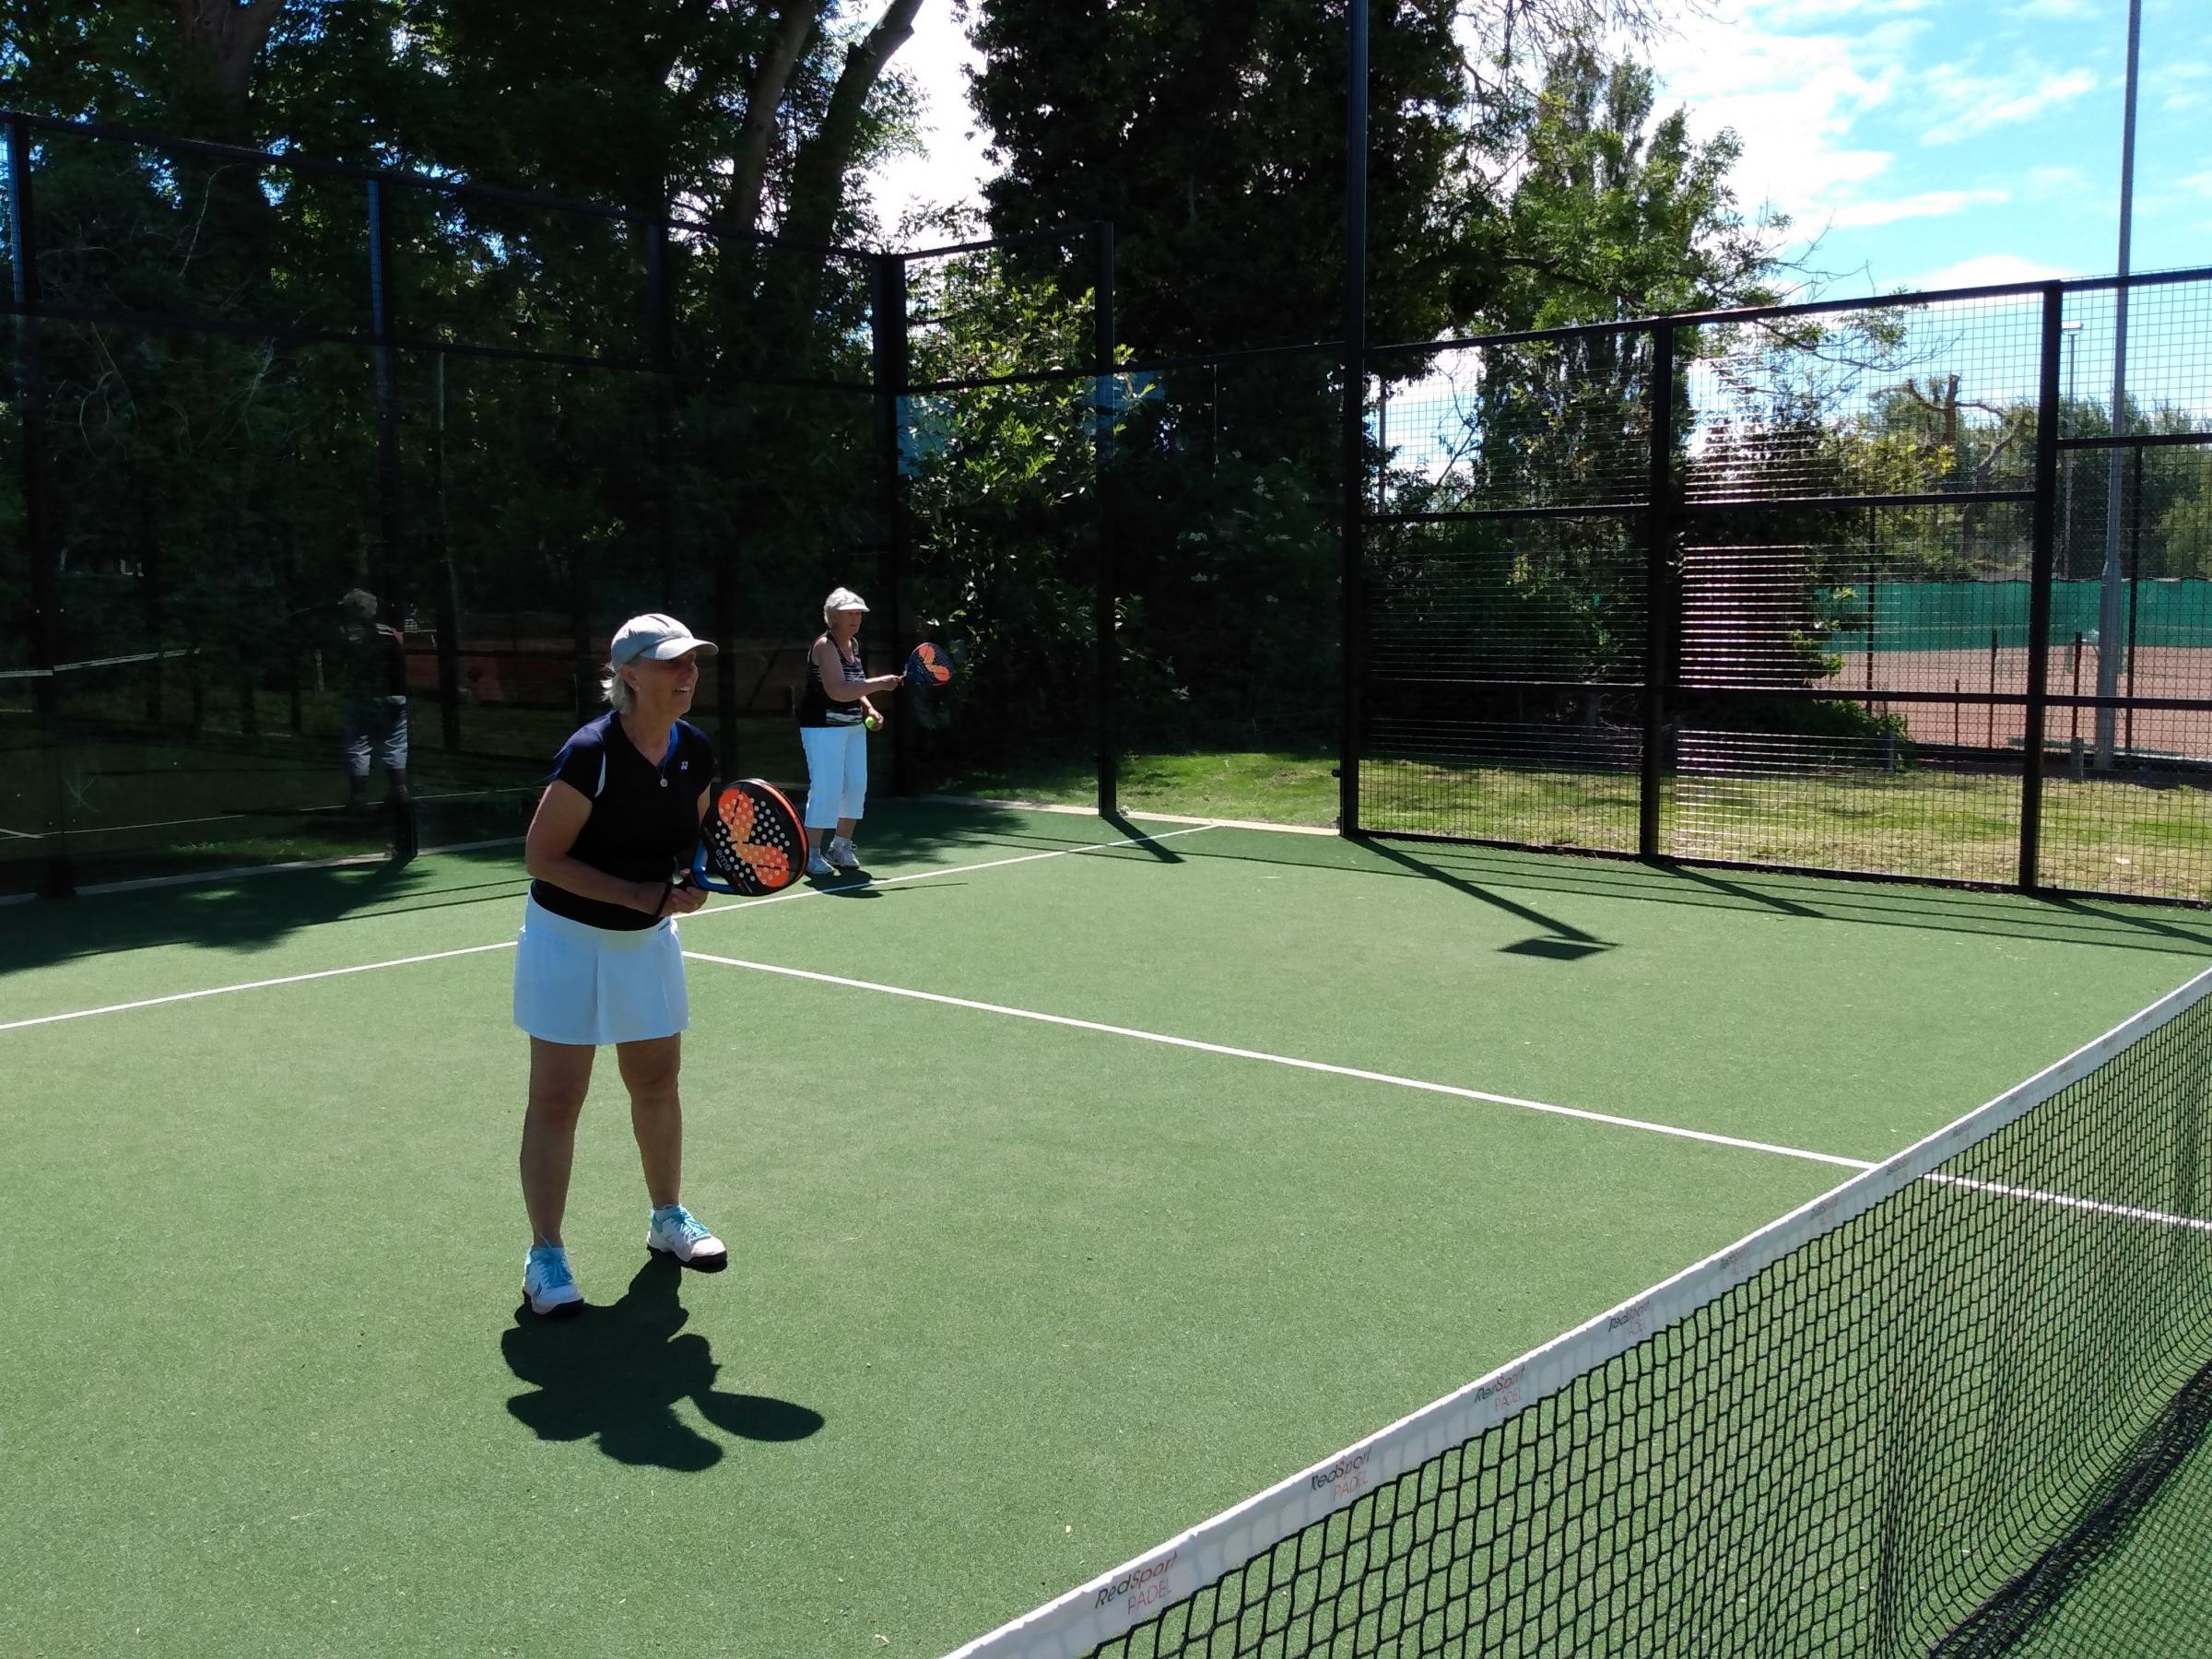 Edwina Gill (left) and Barbara Dawes playing Padel Tennis at Windsor Lawn Tennis Club in Penarth.